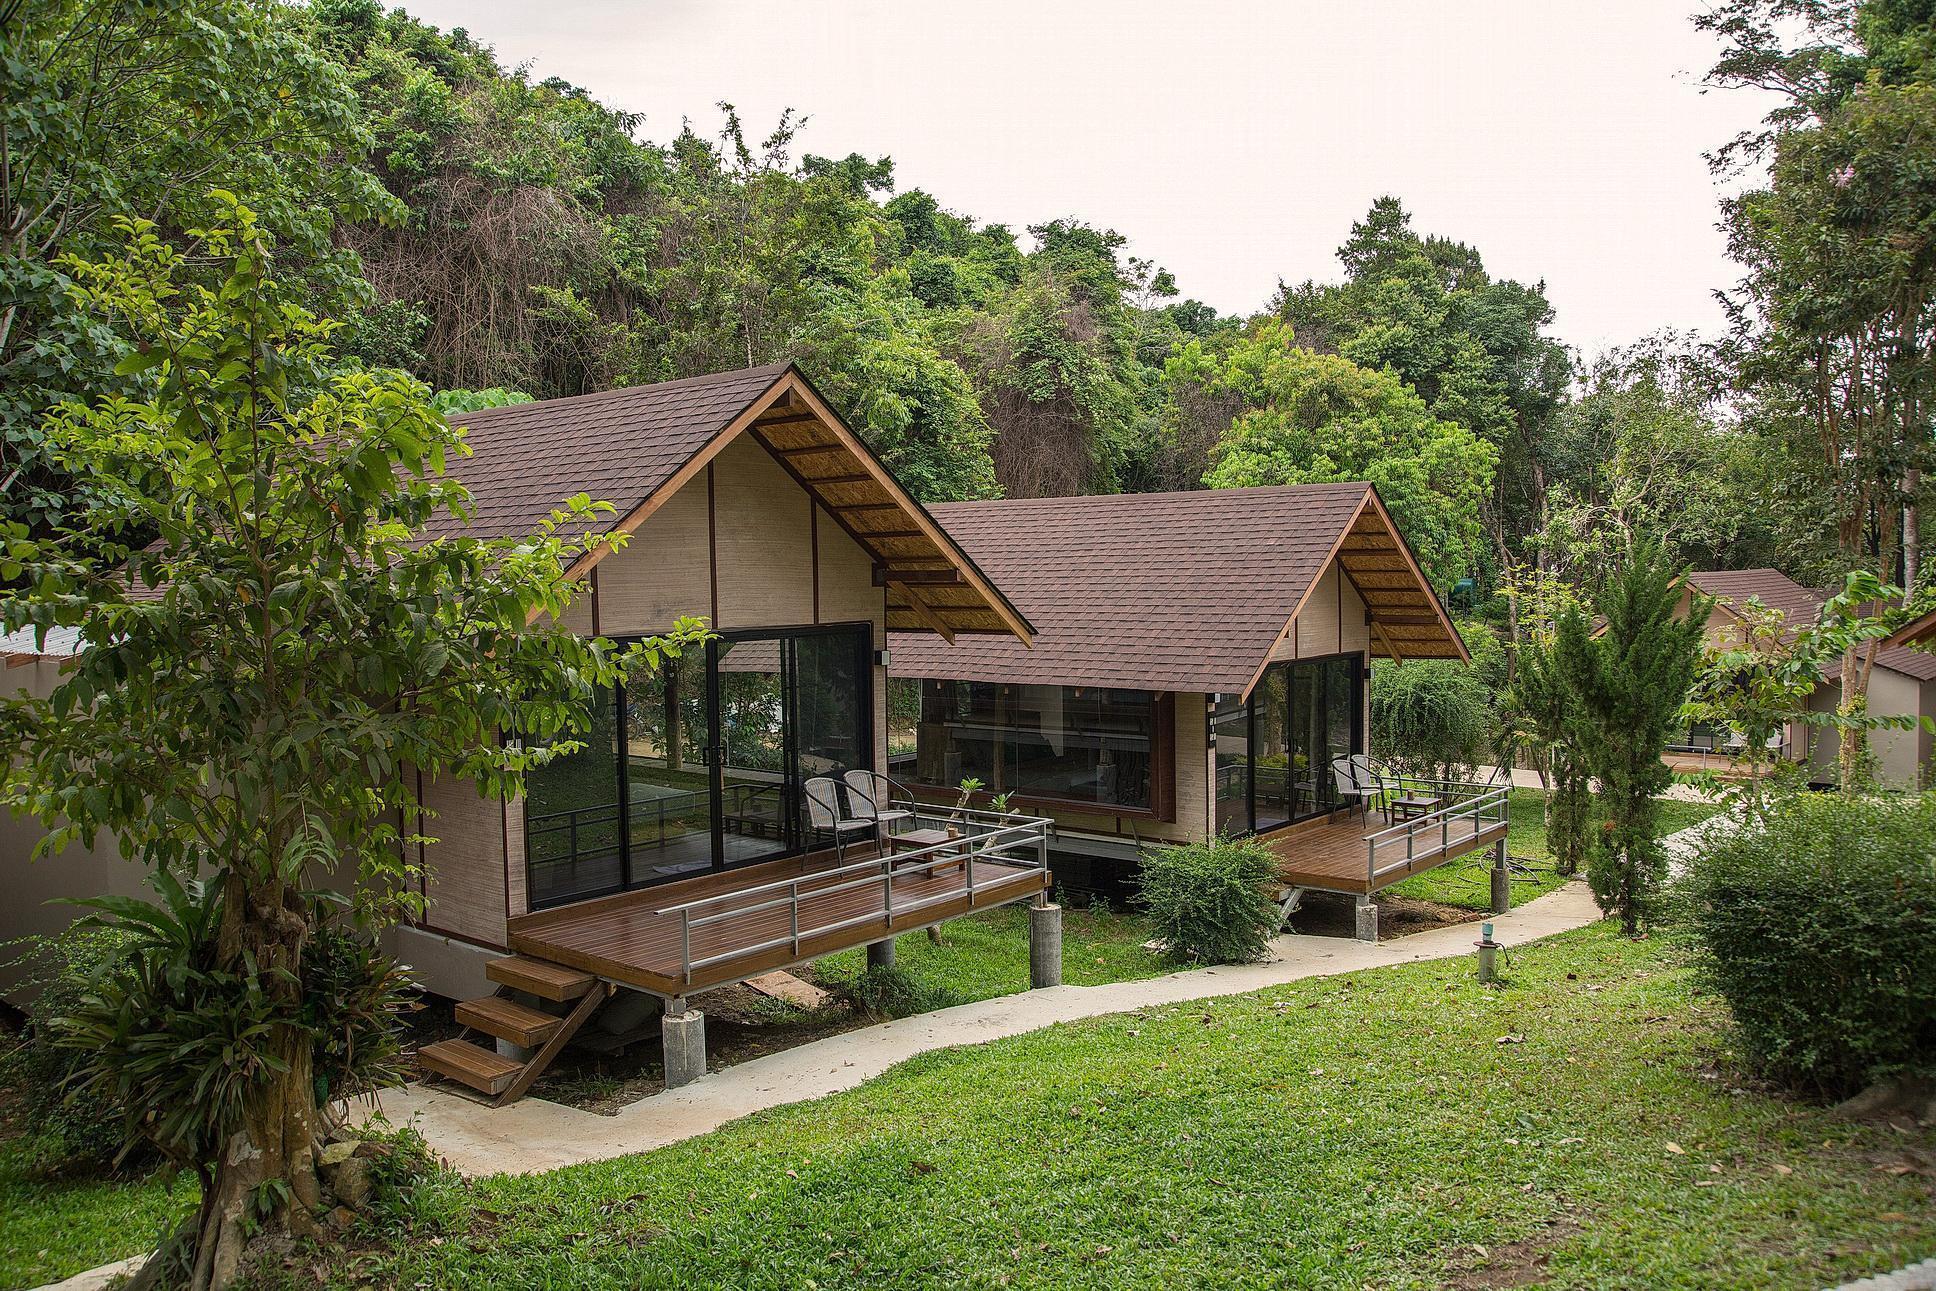 SriLanta Resort and Spa ศรีลันตา รีสอร์ต แอนด์ สปา